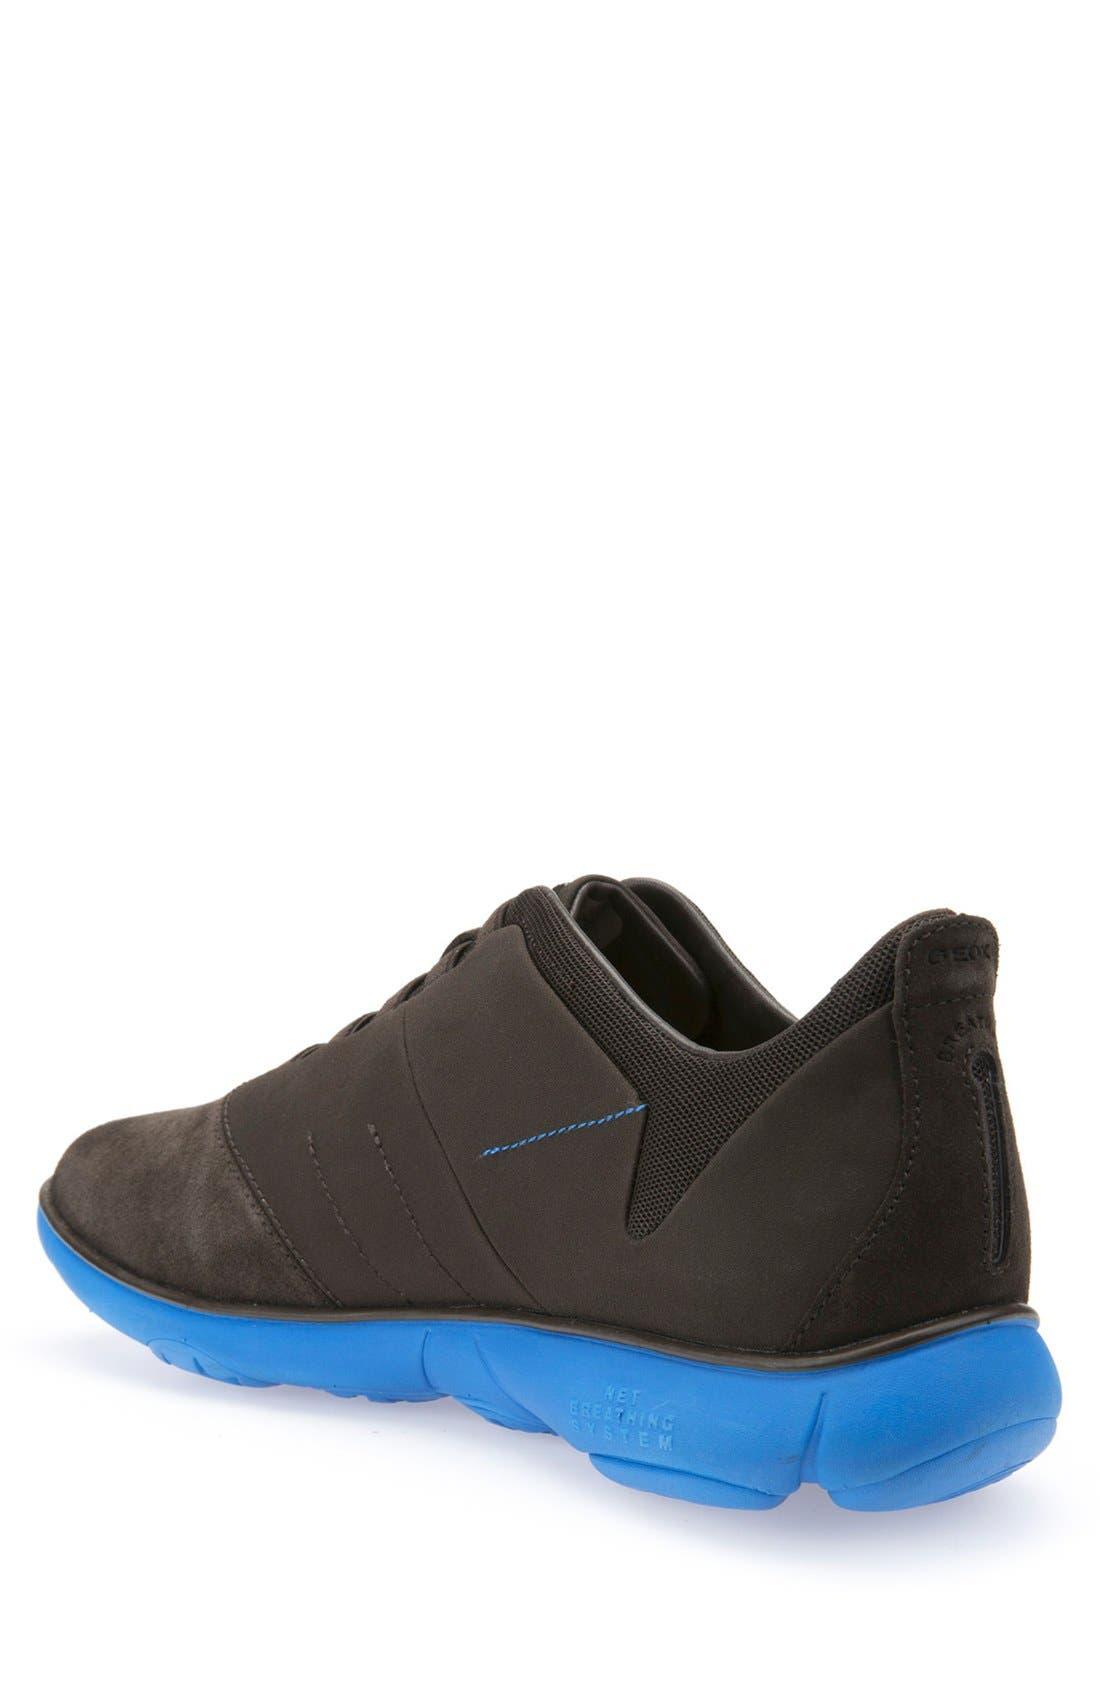 Alternate Image 2  - Geox 'Nebula 24' Slip-On Sneaker (Men)